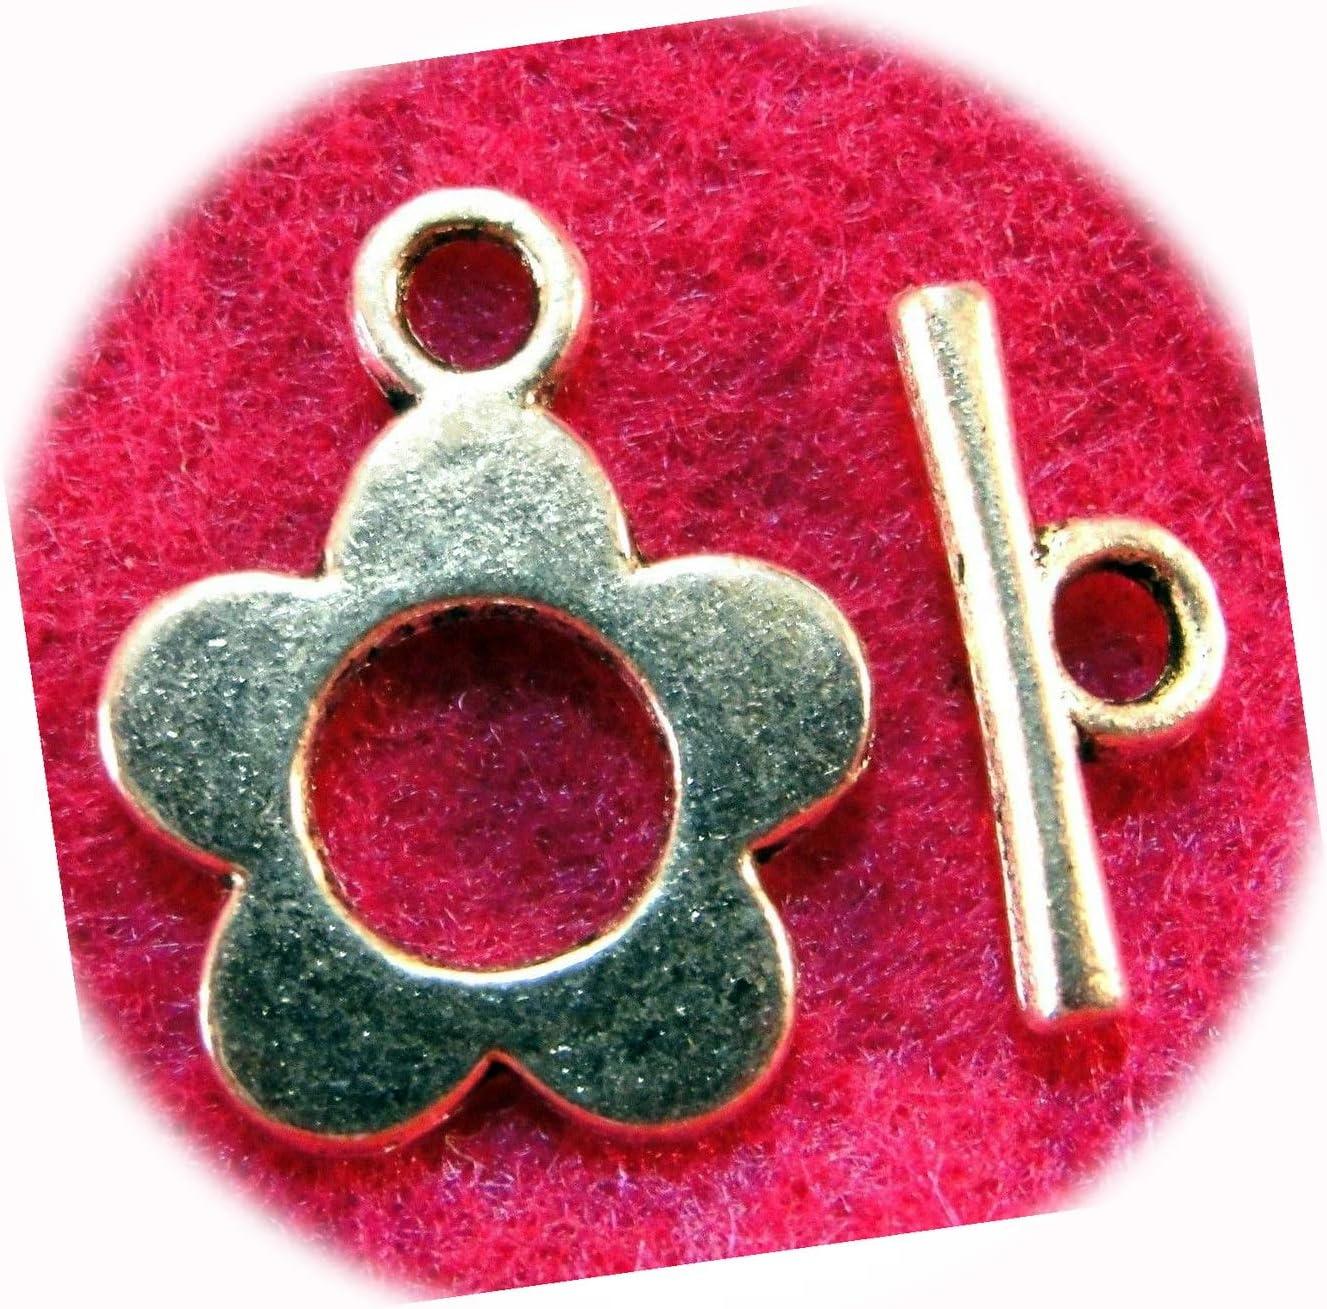 50Sets Tibetan Silver Flower Toggle Connectors Cheap sale Clasps 40% OFF Cheap Sale Ador Hooks